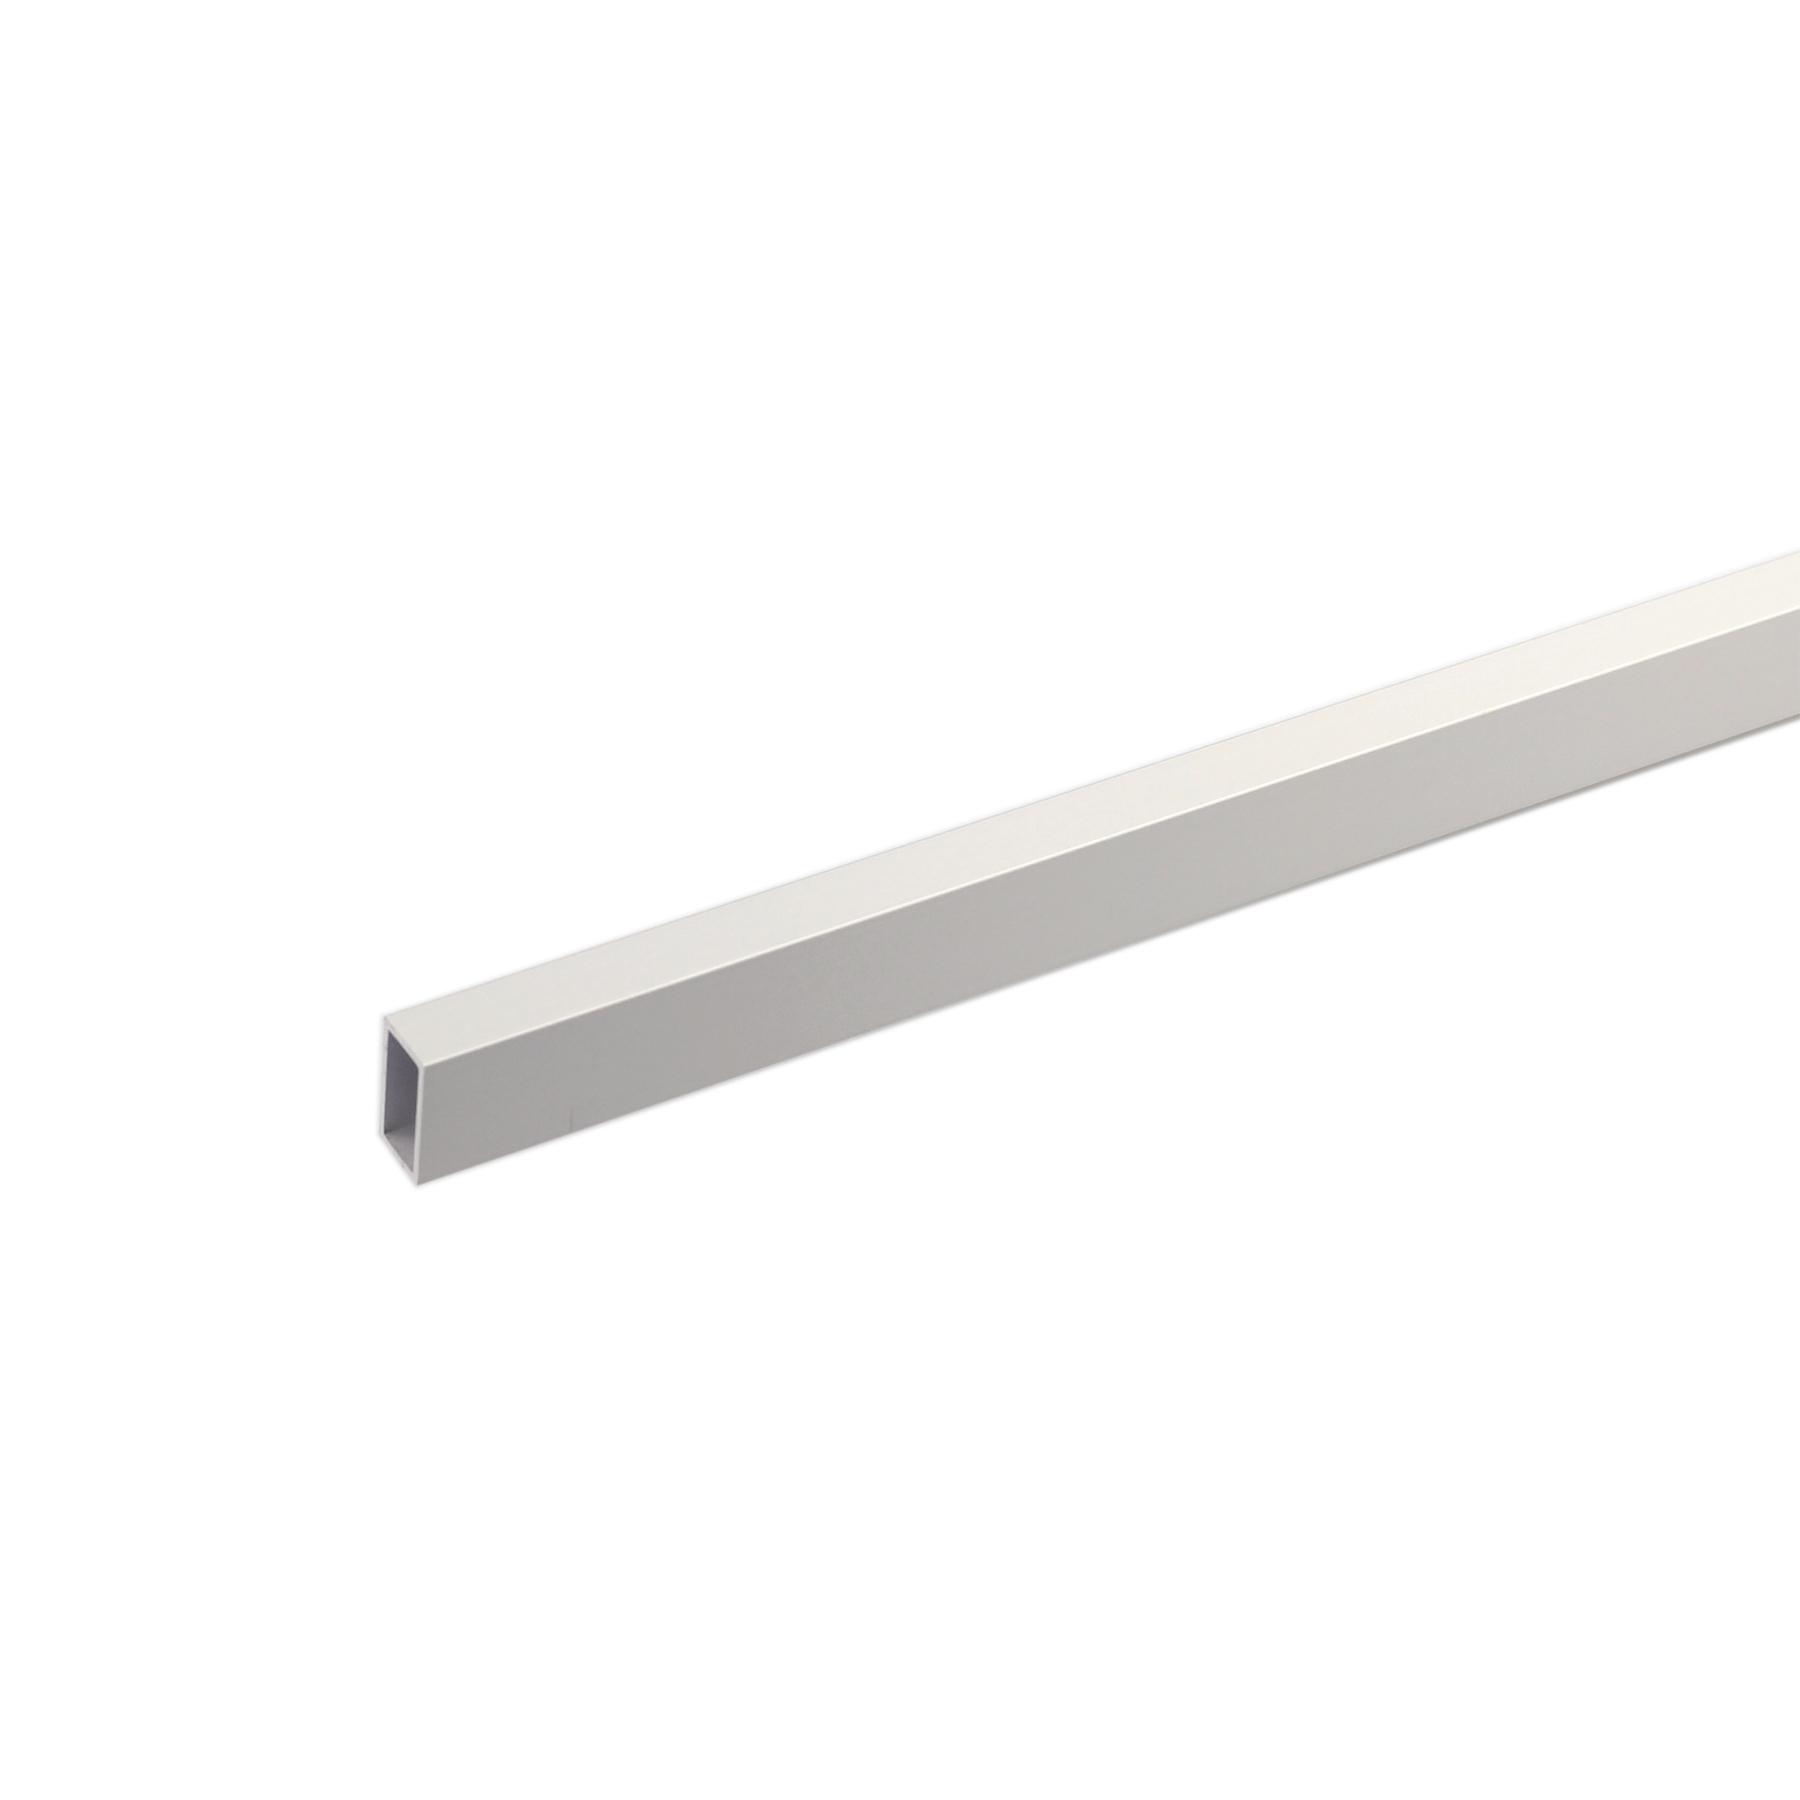 Perfil alum nio tubo retangular 1mx40x20mm anodizado for Perfil u aluminio leroy merlin